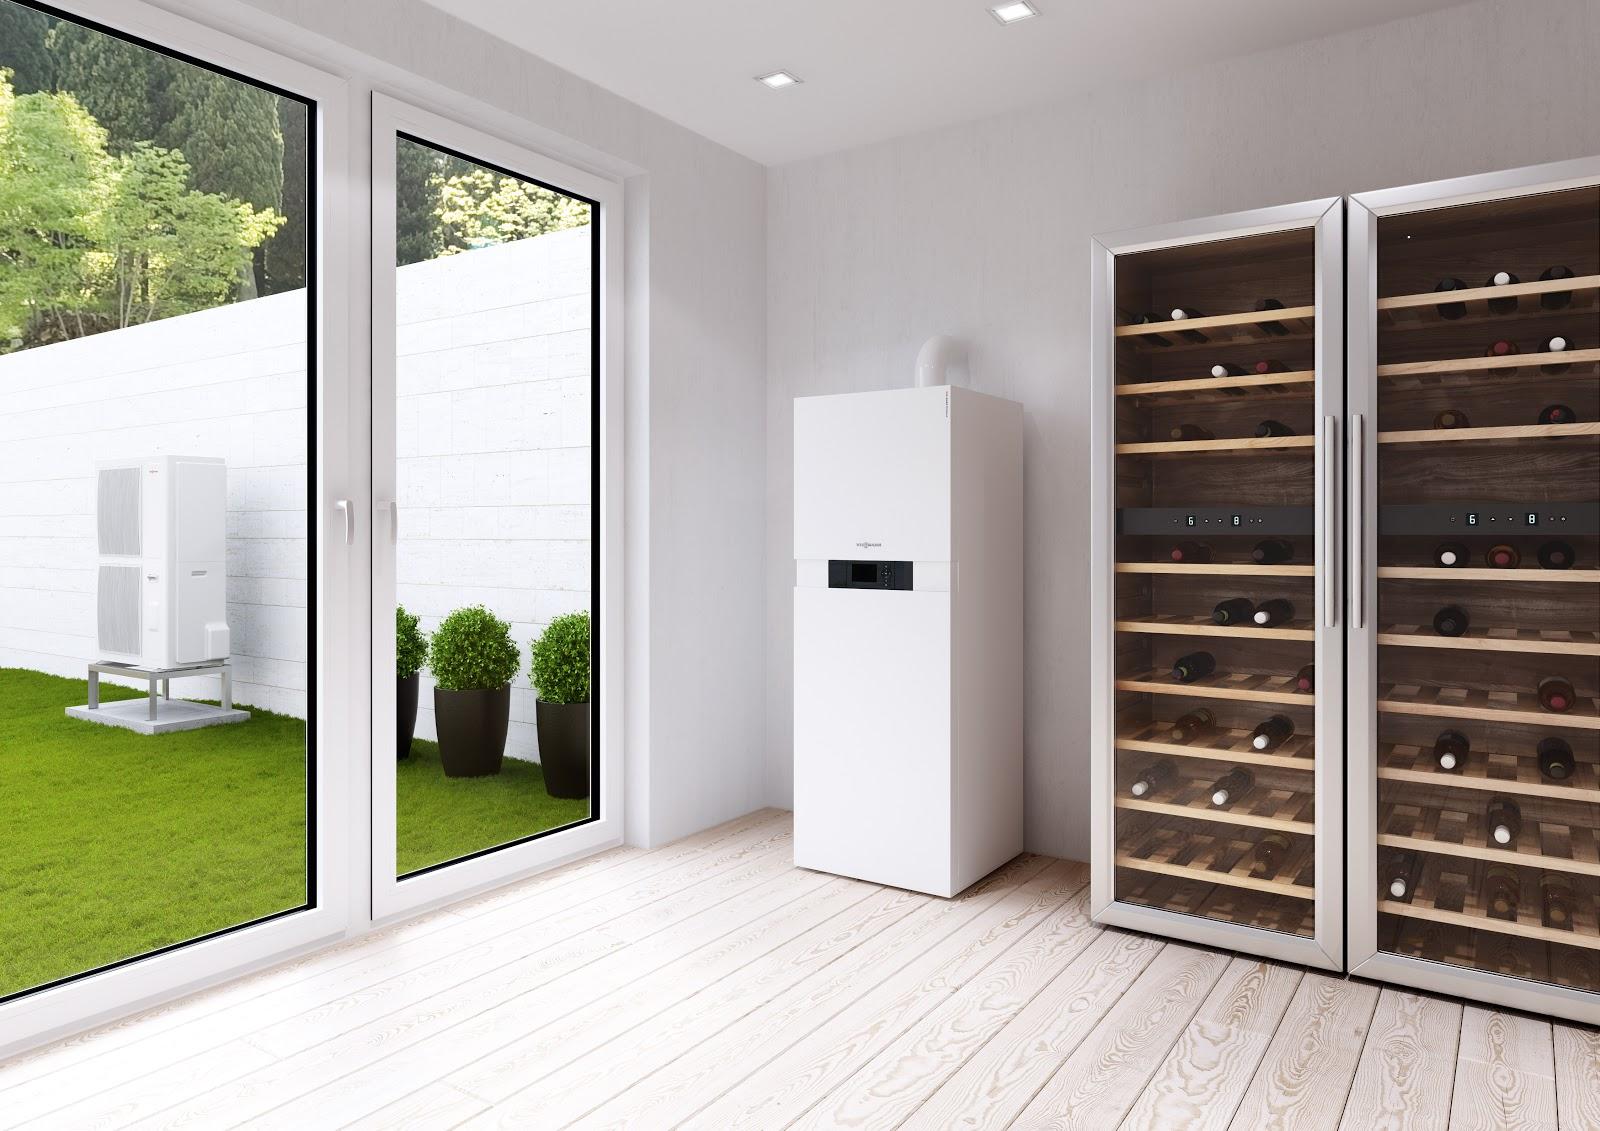 viessmann vitocaldens 222 f pompe chaleur hybride pour. Black Bedroom Furniture Sets. Home Design Ideas